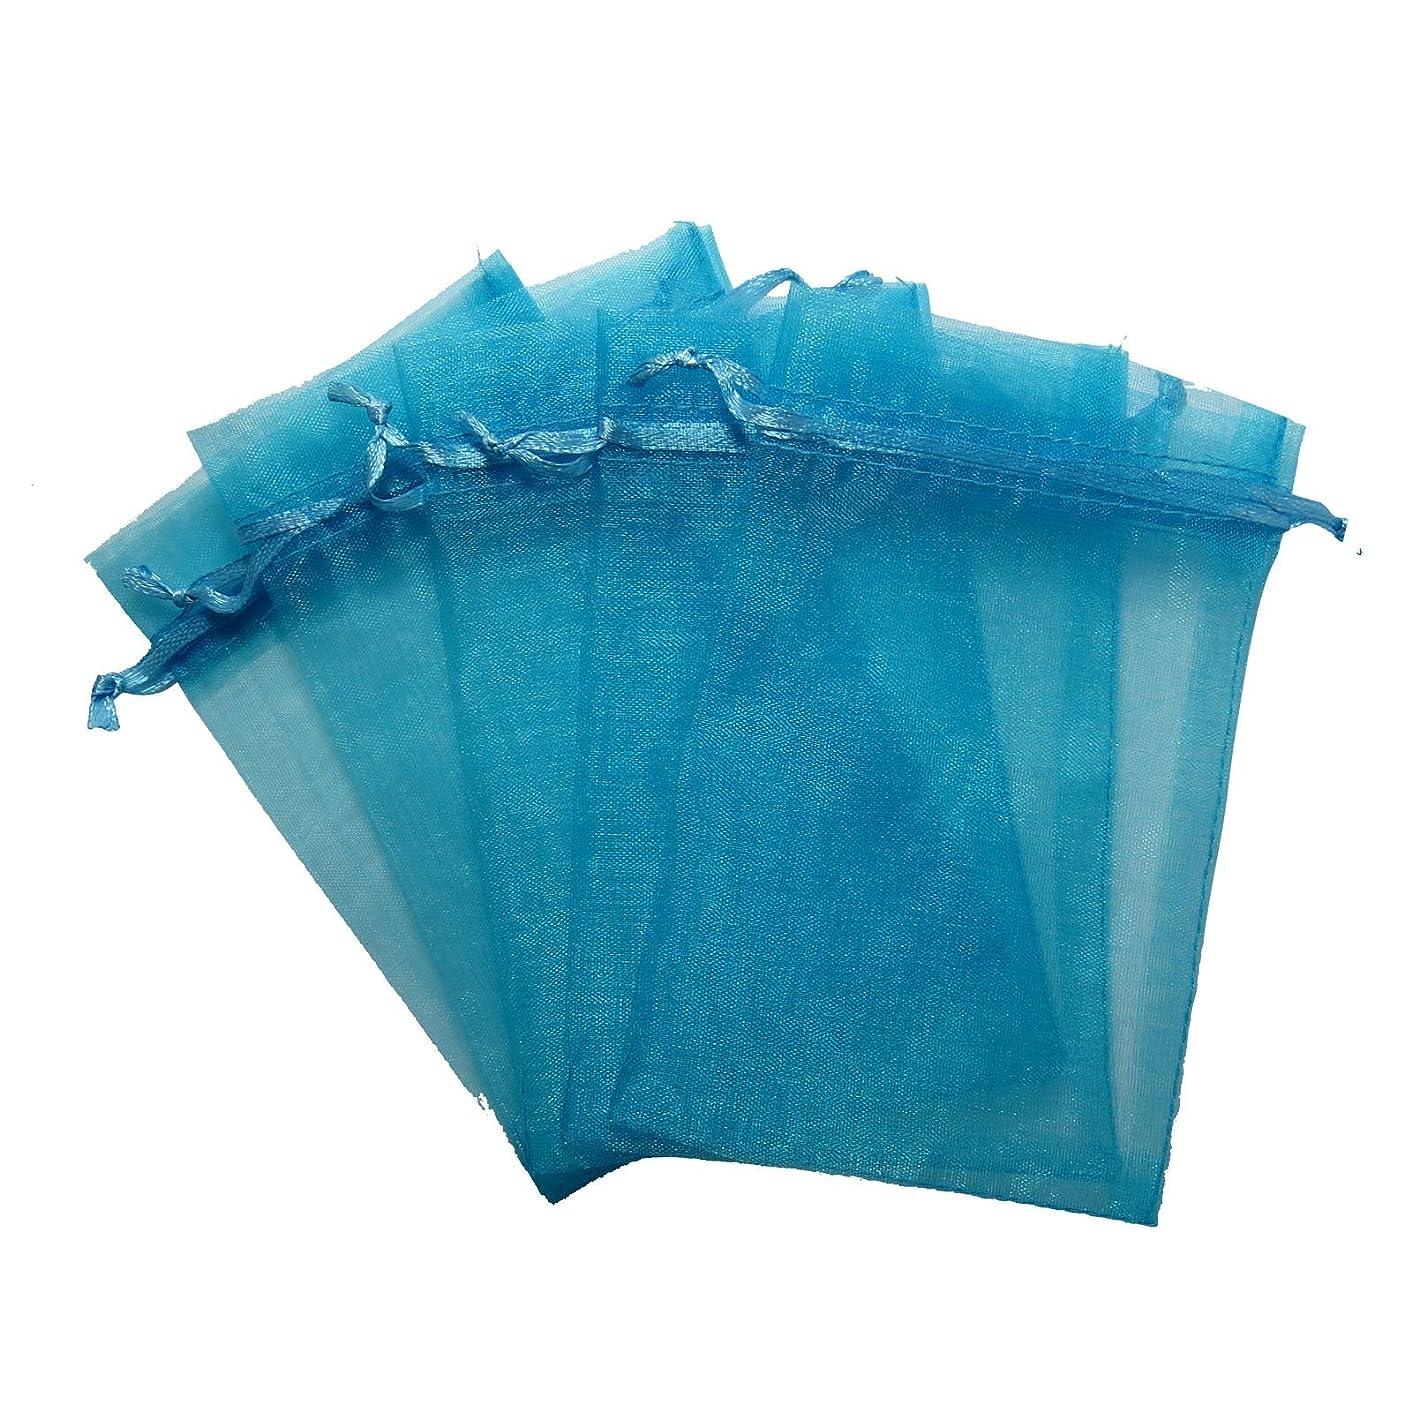 RakrisaSupplies 100Pcs Lake Blue Organza Bags 3x4